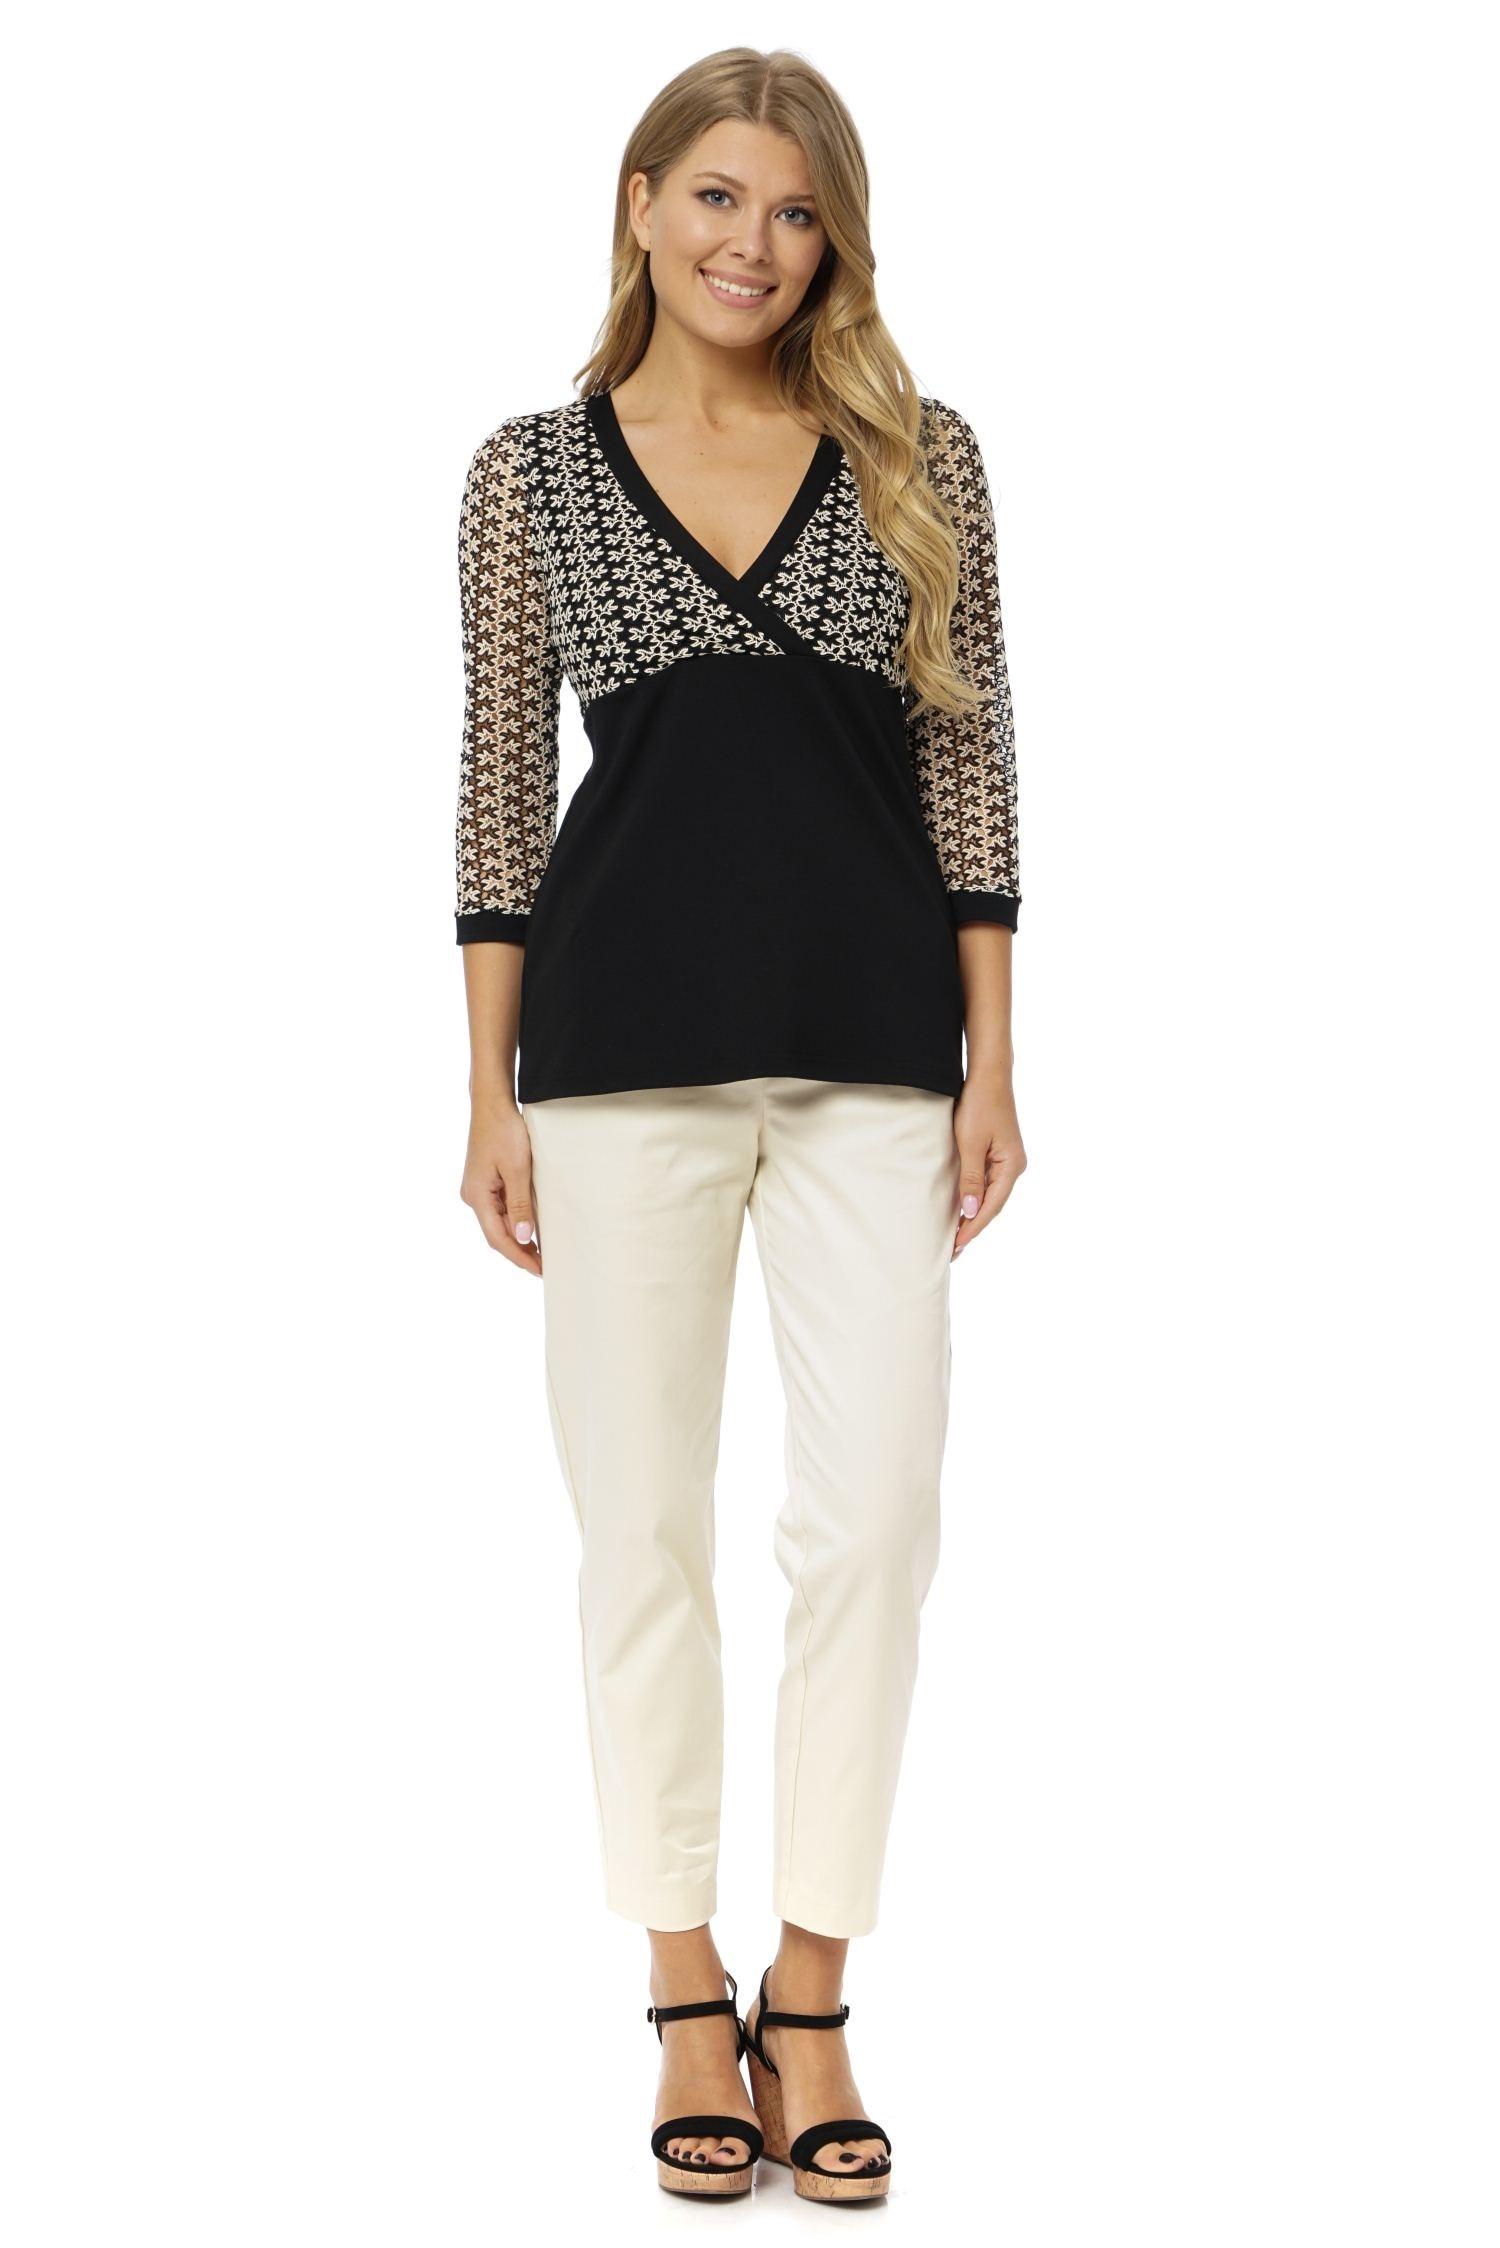 Blouses plus collar knot blouses